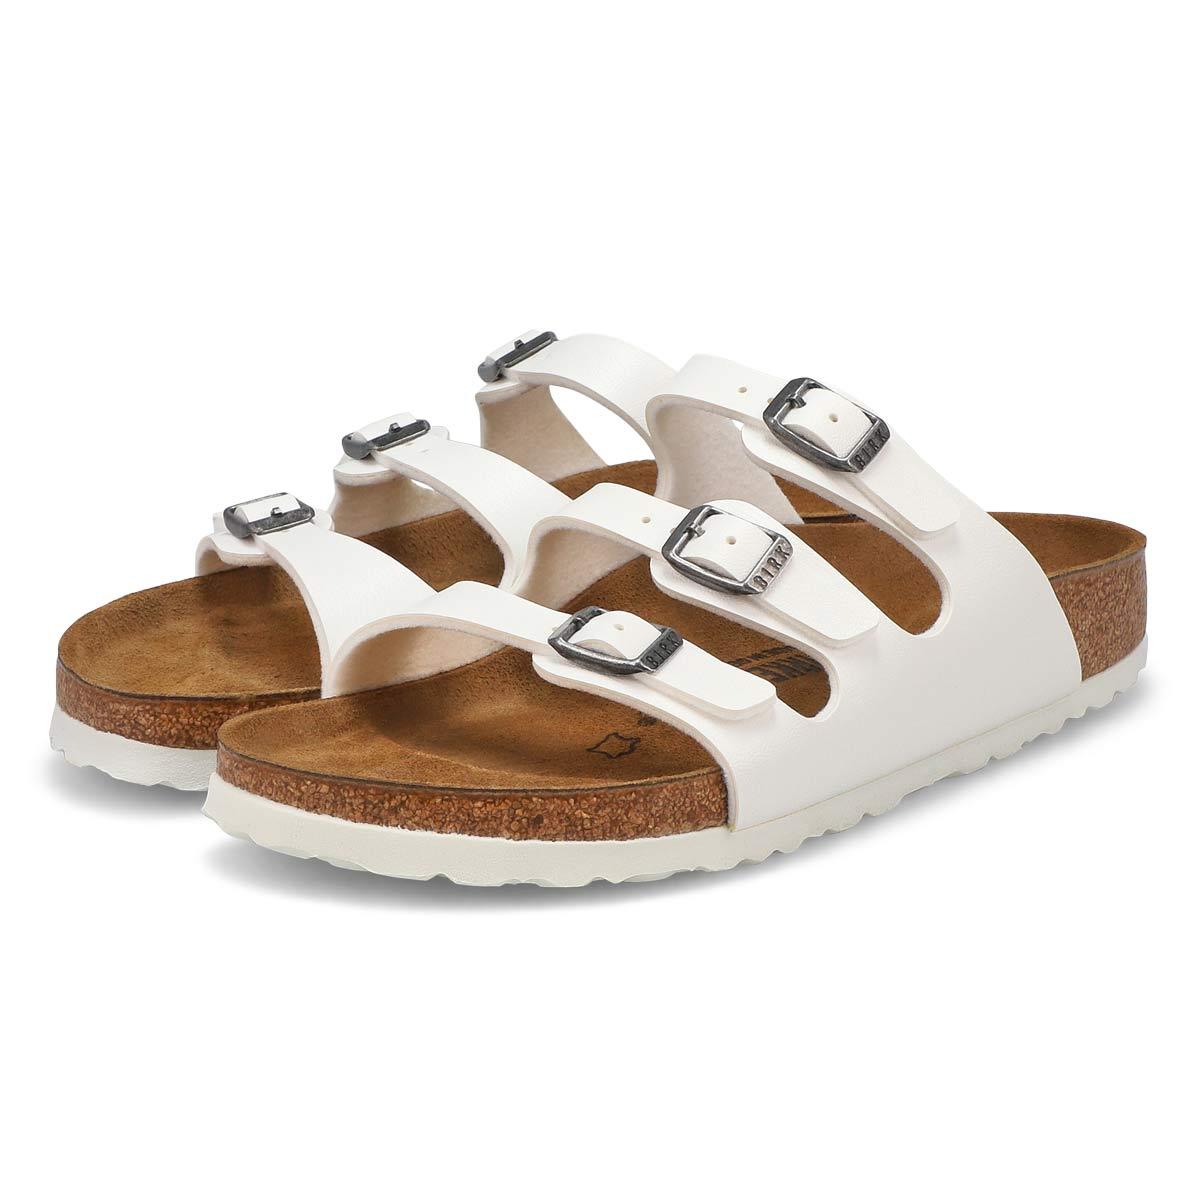 Sandale FLORIDA BF blanc femmes